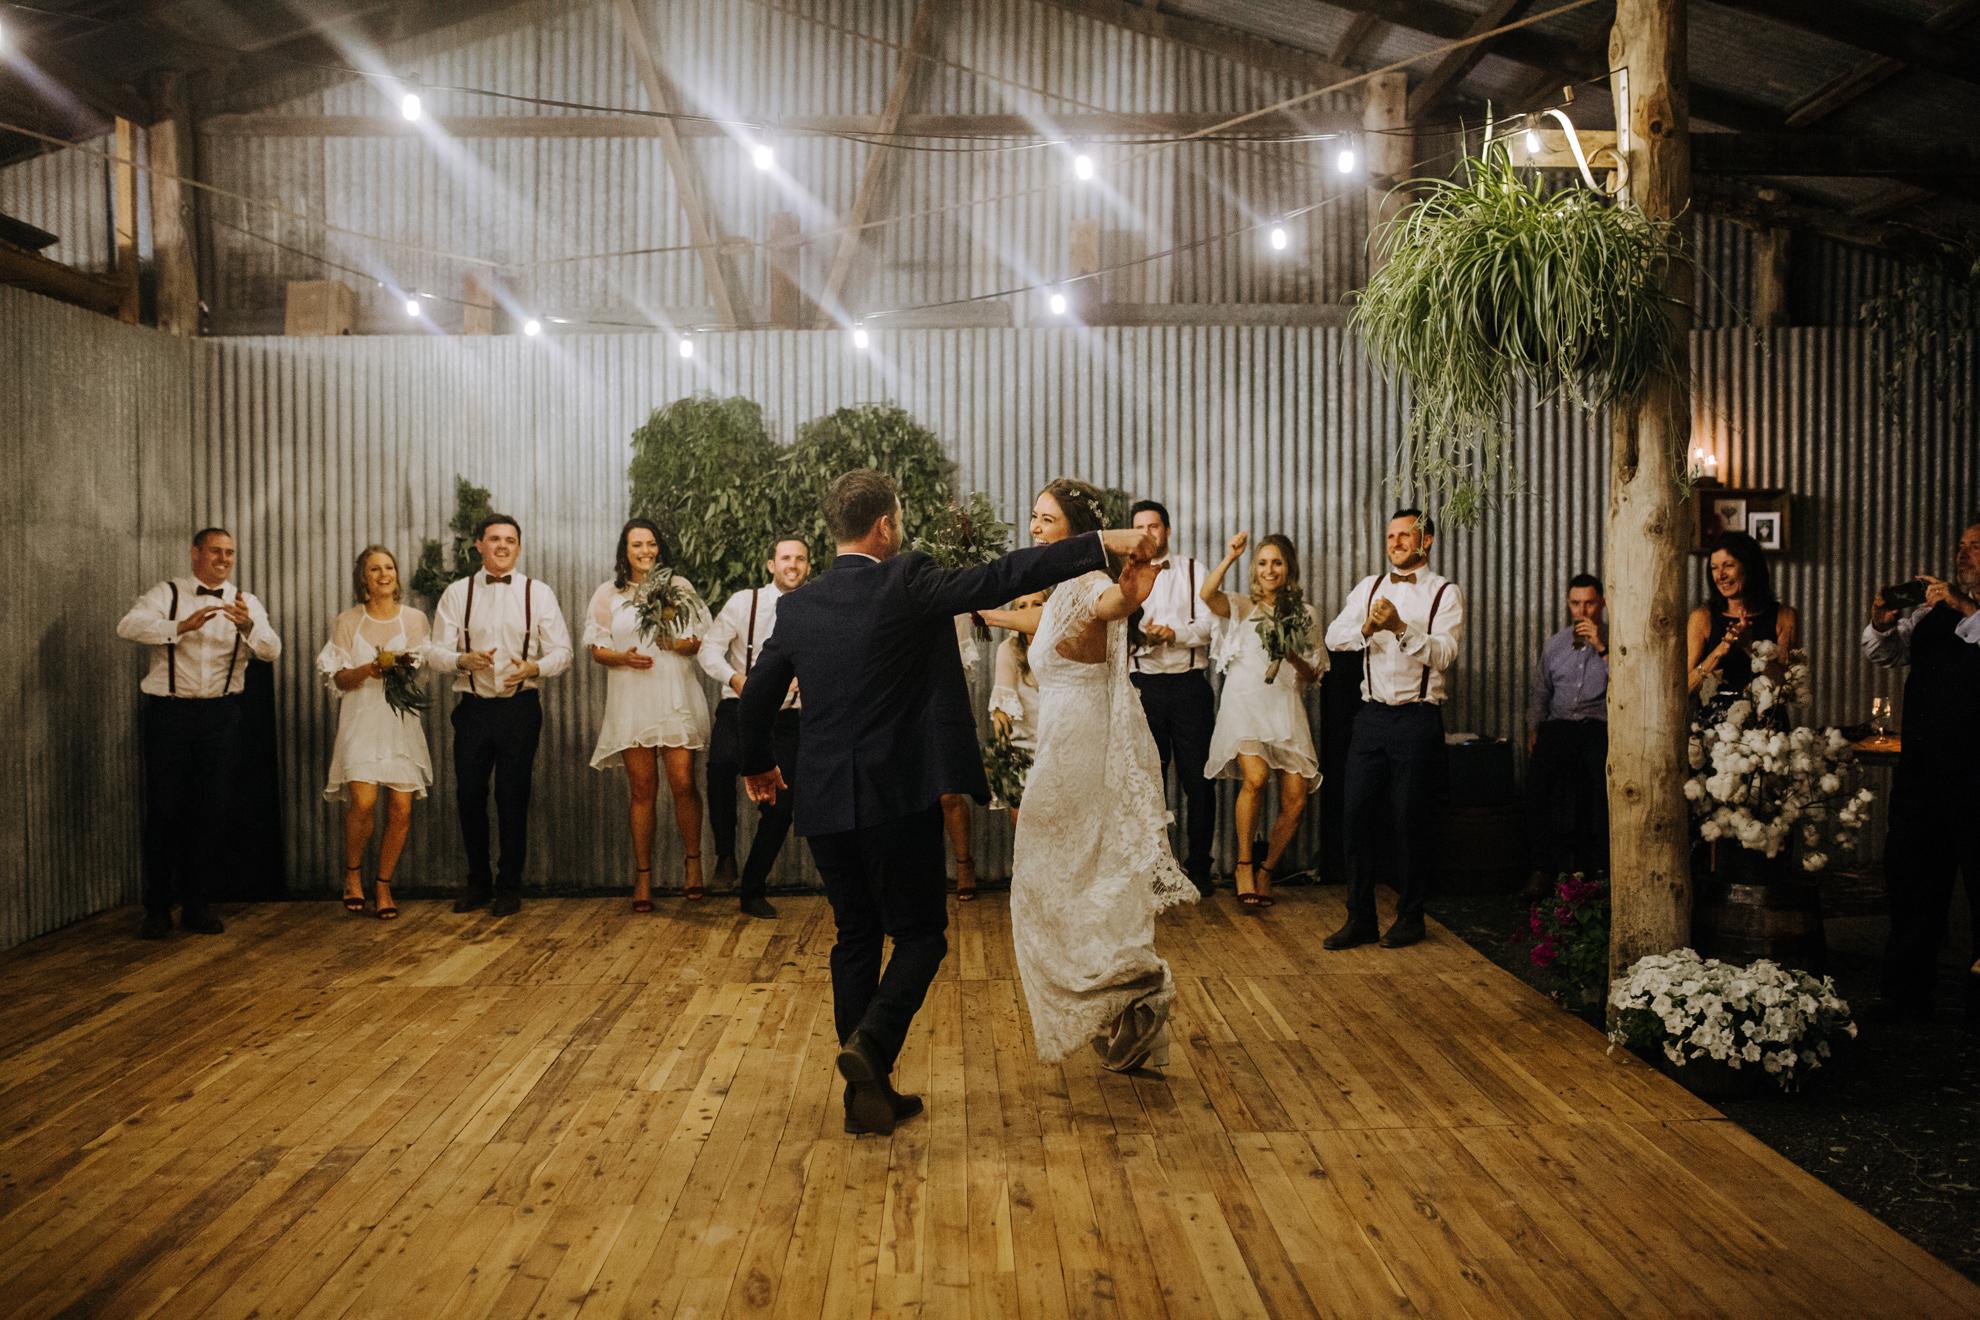 098-Jason_Jessie_Dalby_Country_Wedding.jpg